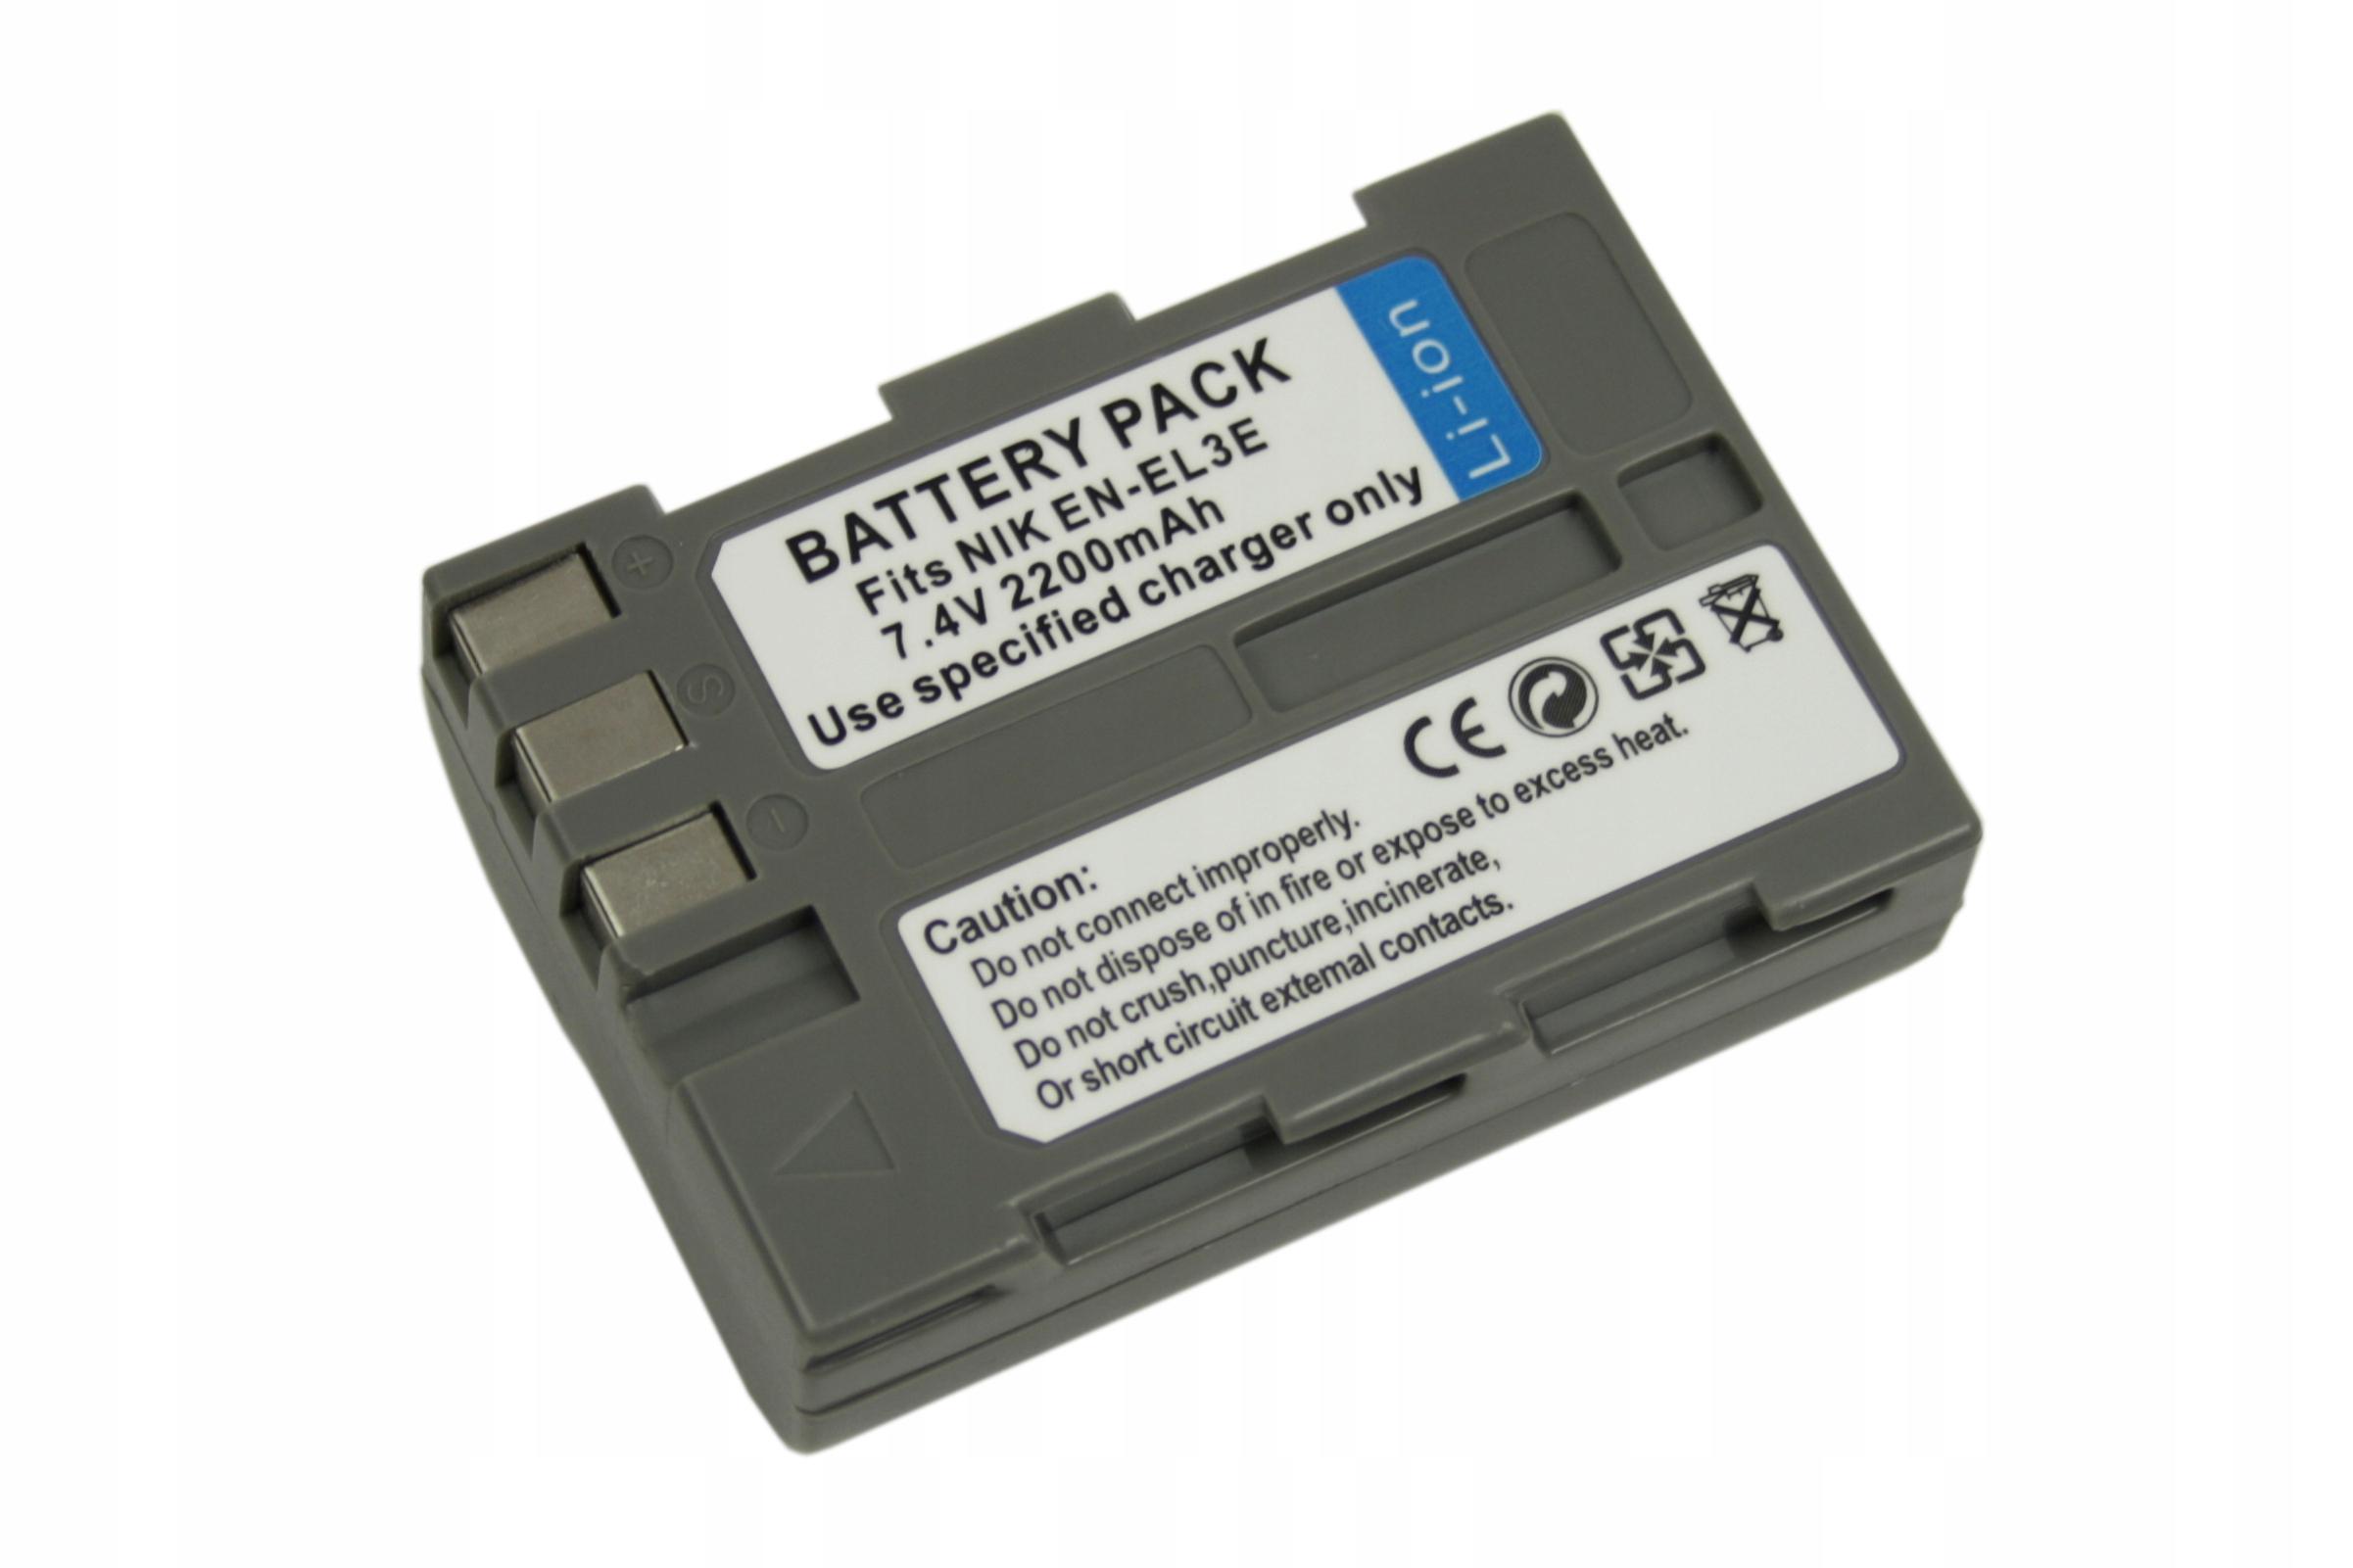 BATERIA AKUMULATOR NIKON EN-EL3E D700 D300S D300 D90 D80 - Baterie do aparatów cyfrowych